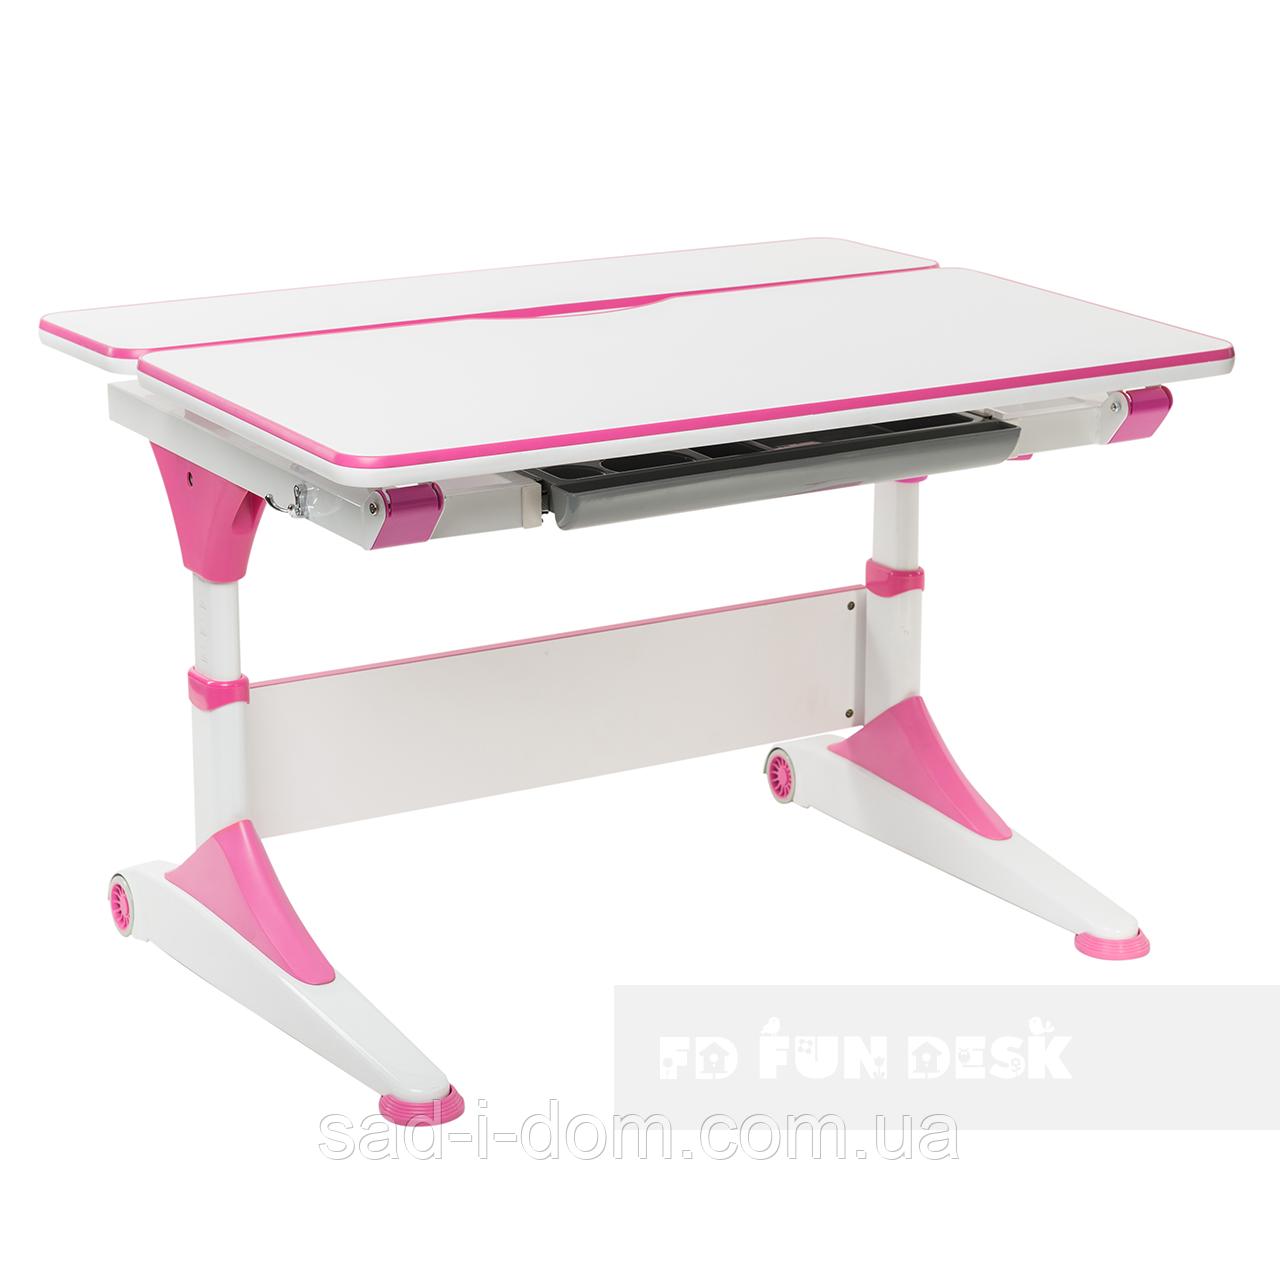 Парта-трансформер для школьника FunDesk Trovare, розовая